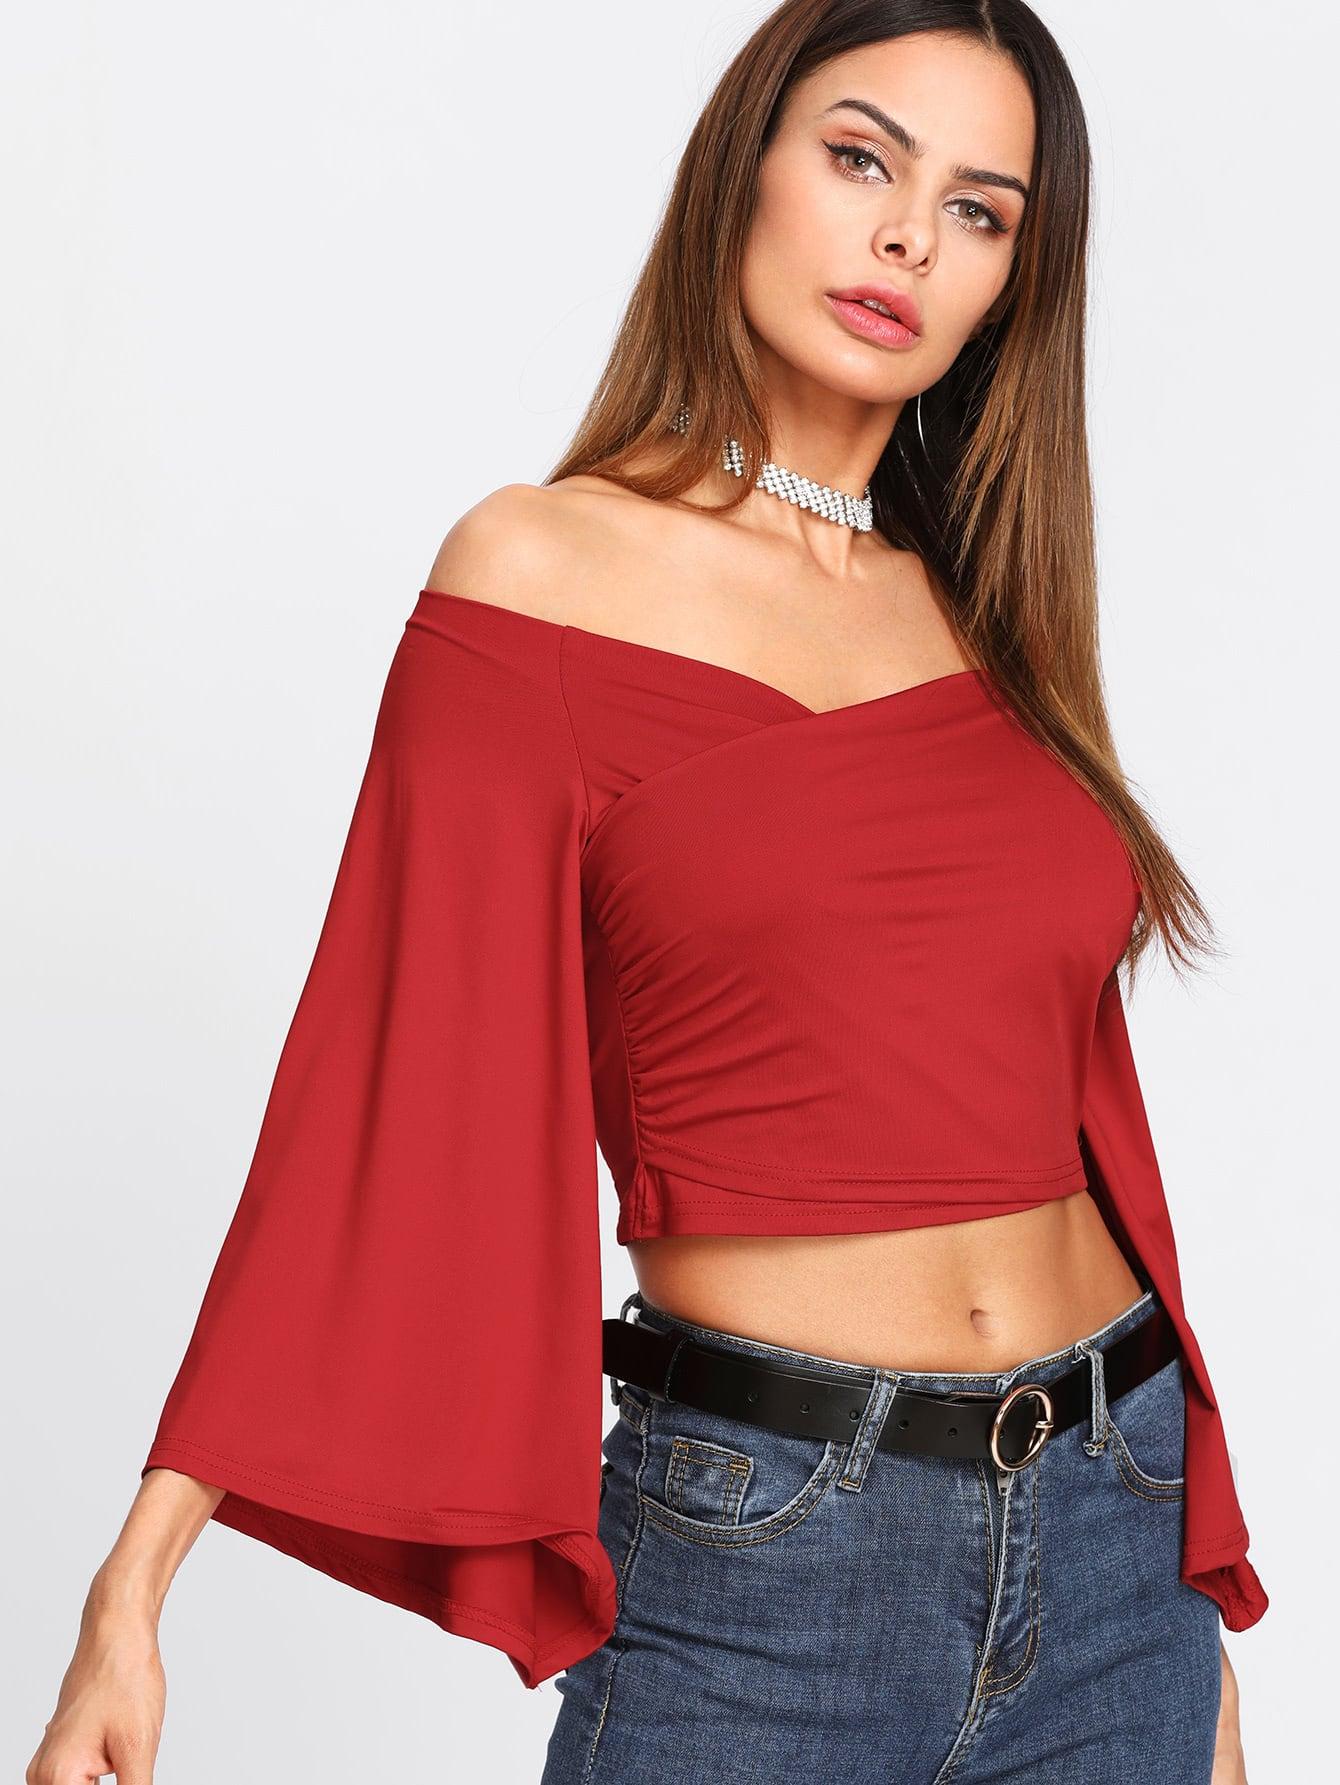 f5a1c281183a8 Off Shoulder Wrap Crop Tee EmmaCloth-Women Fast Fashion Online